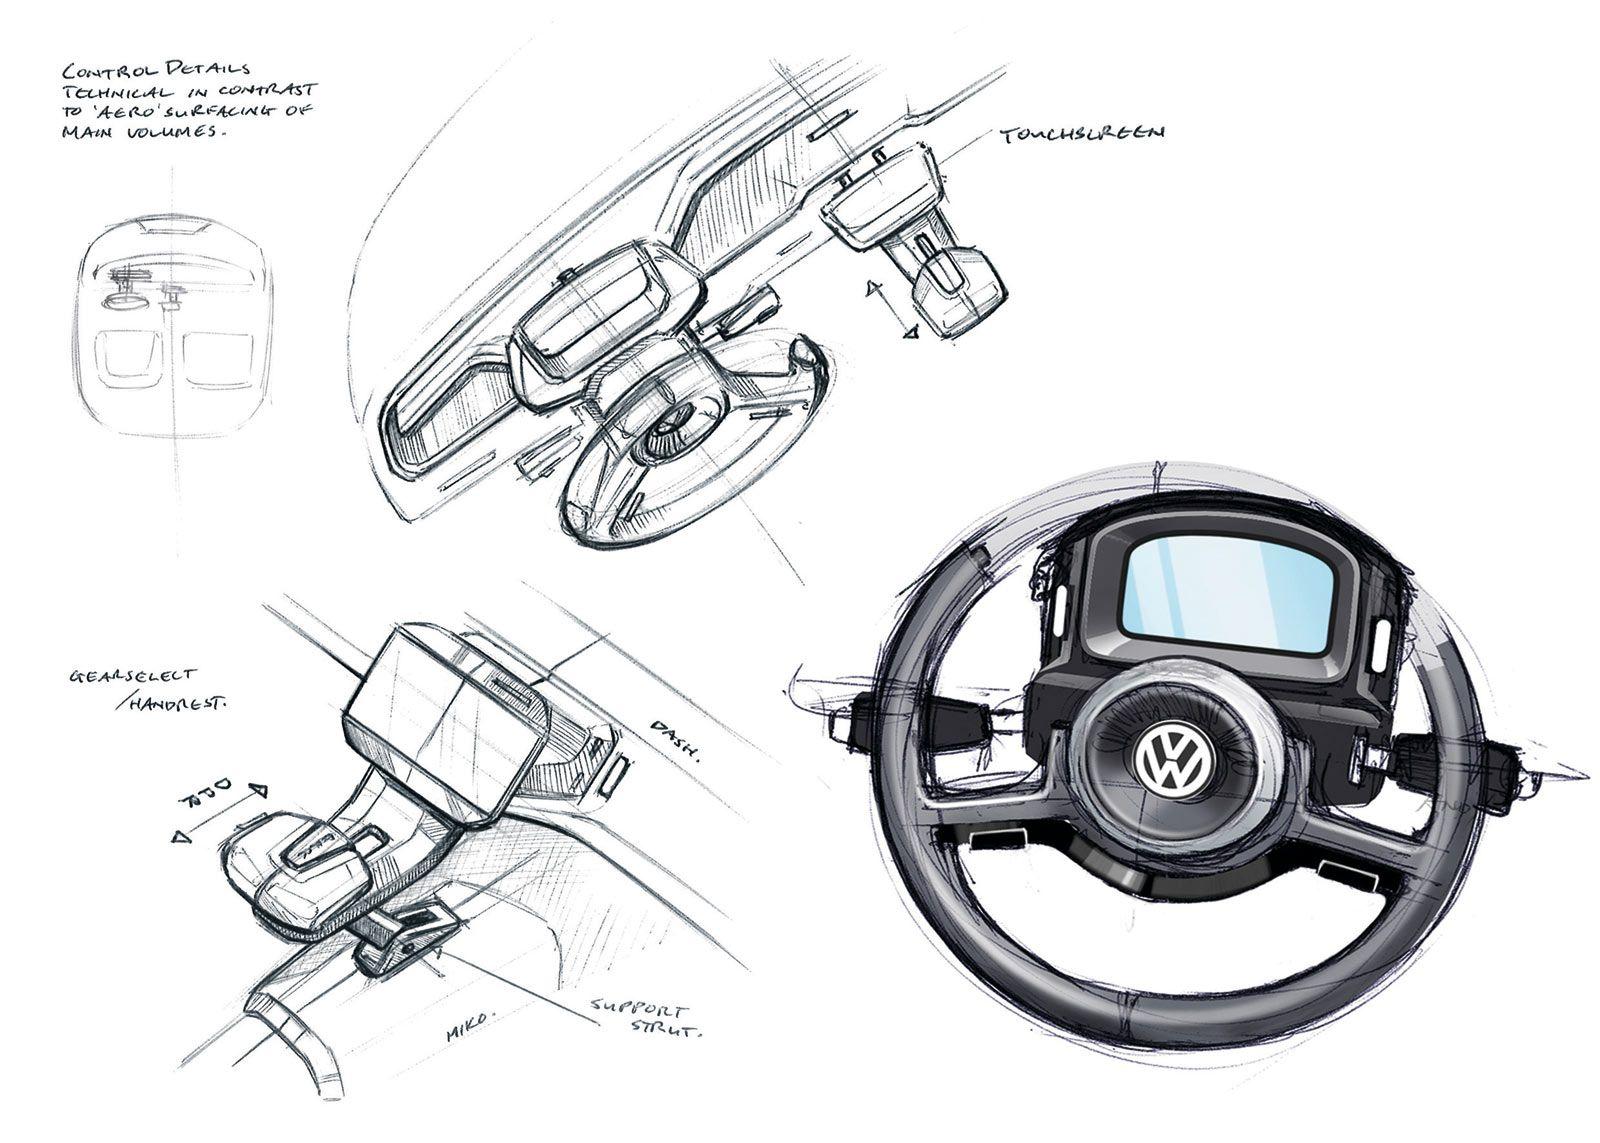 Vw Up Lite Interior Design Sketches